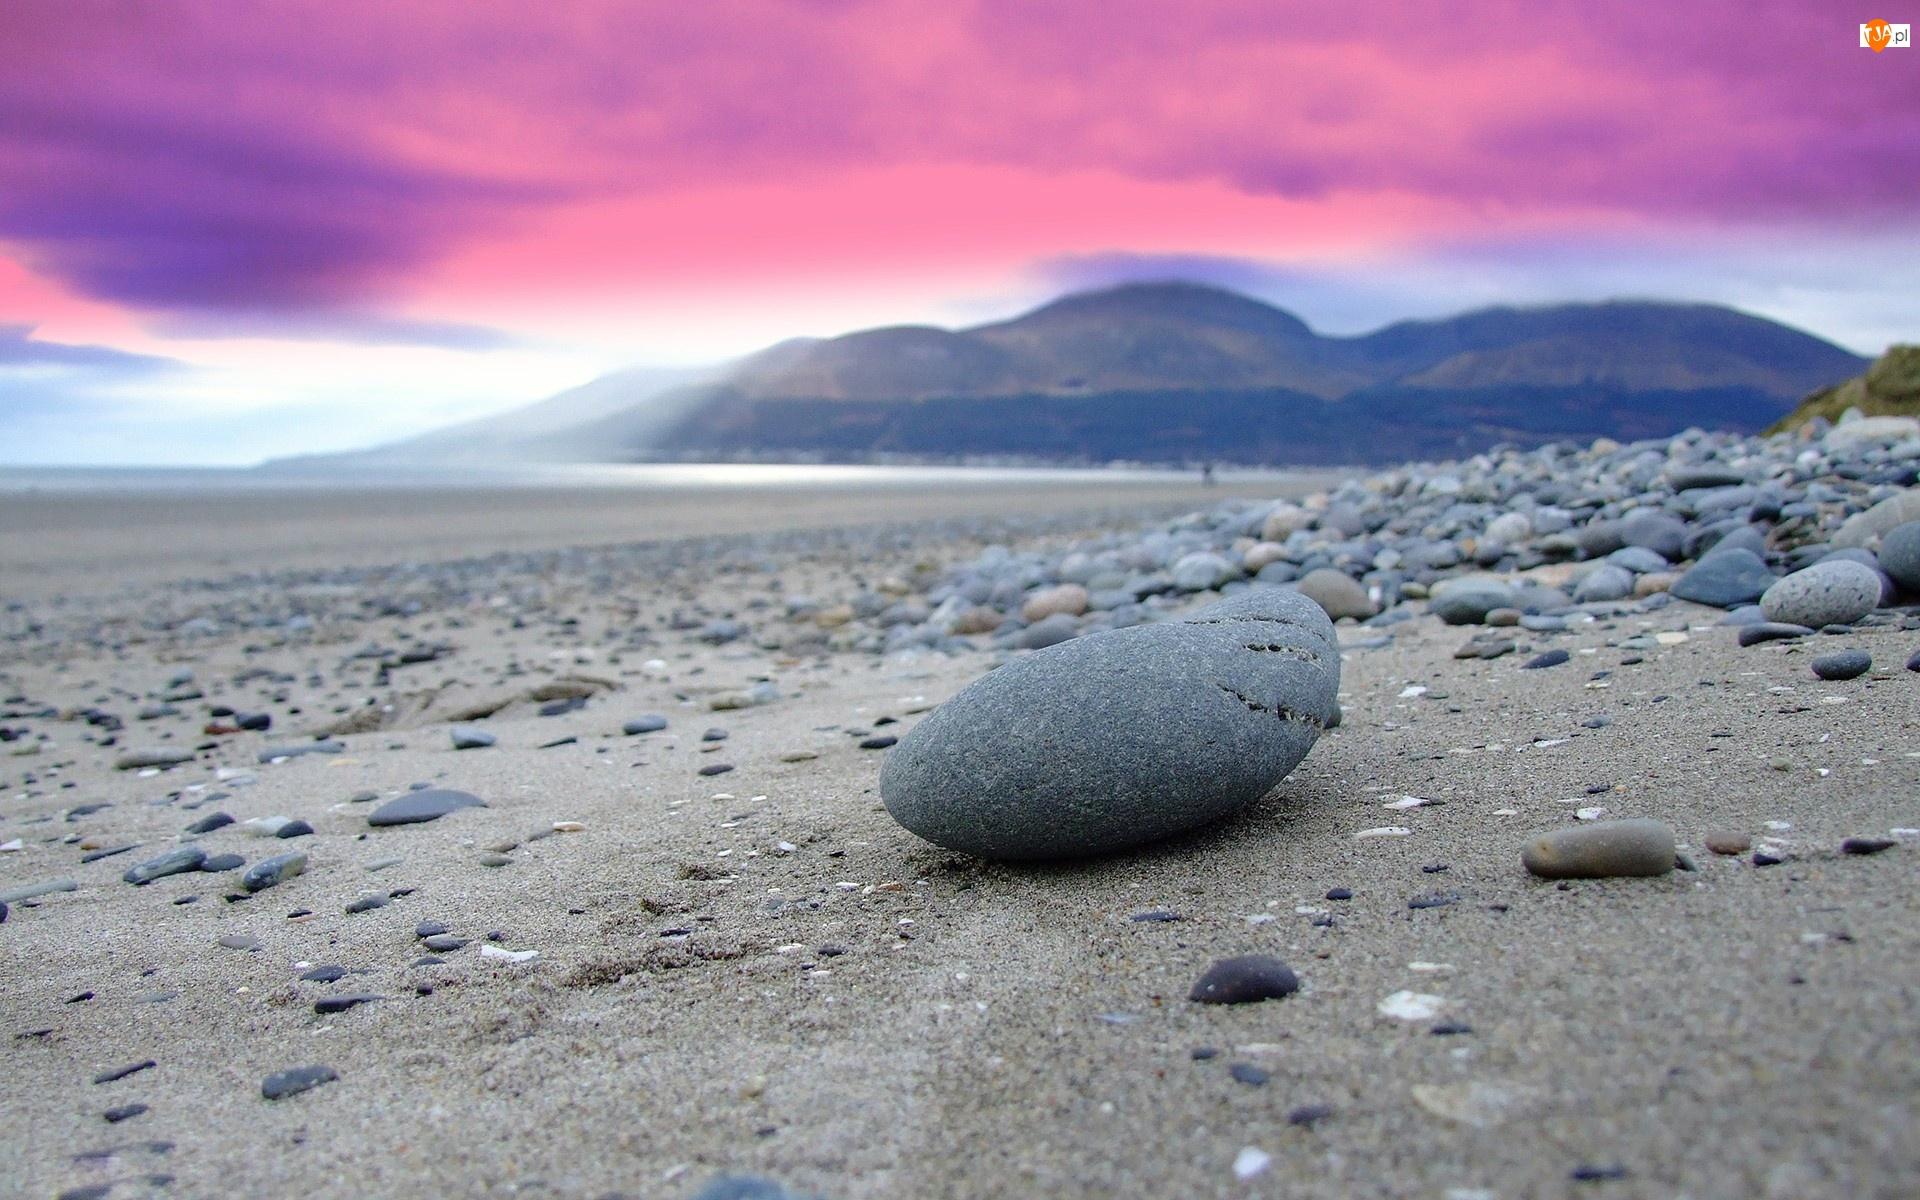 Plaża, Piasek, Kamienie